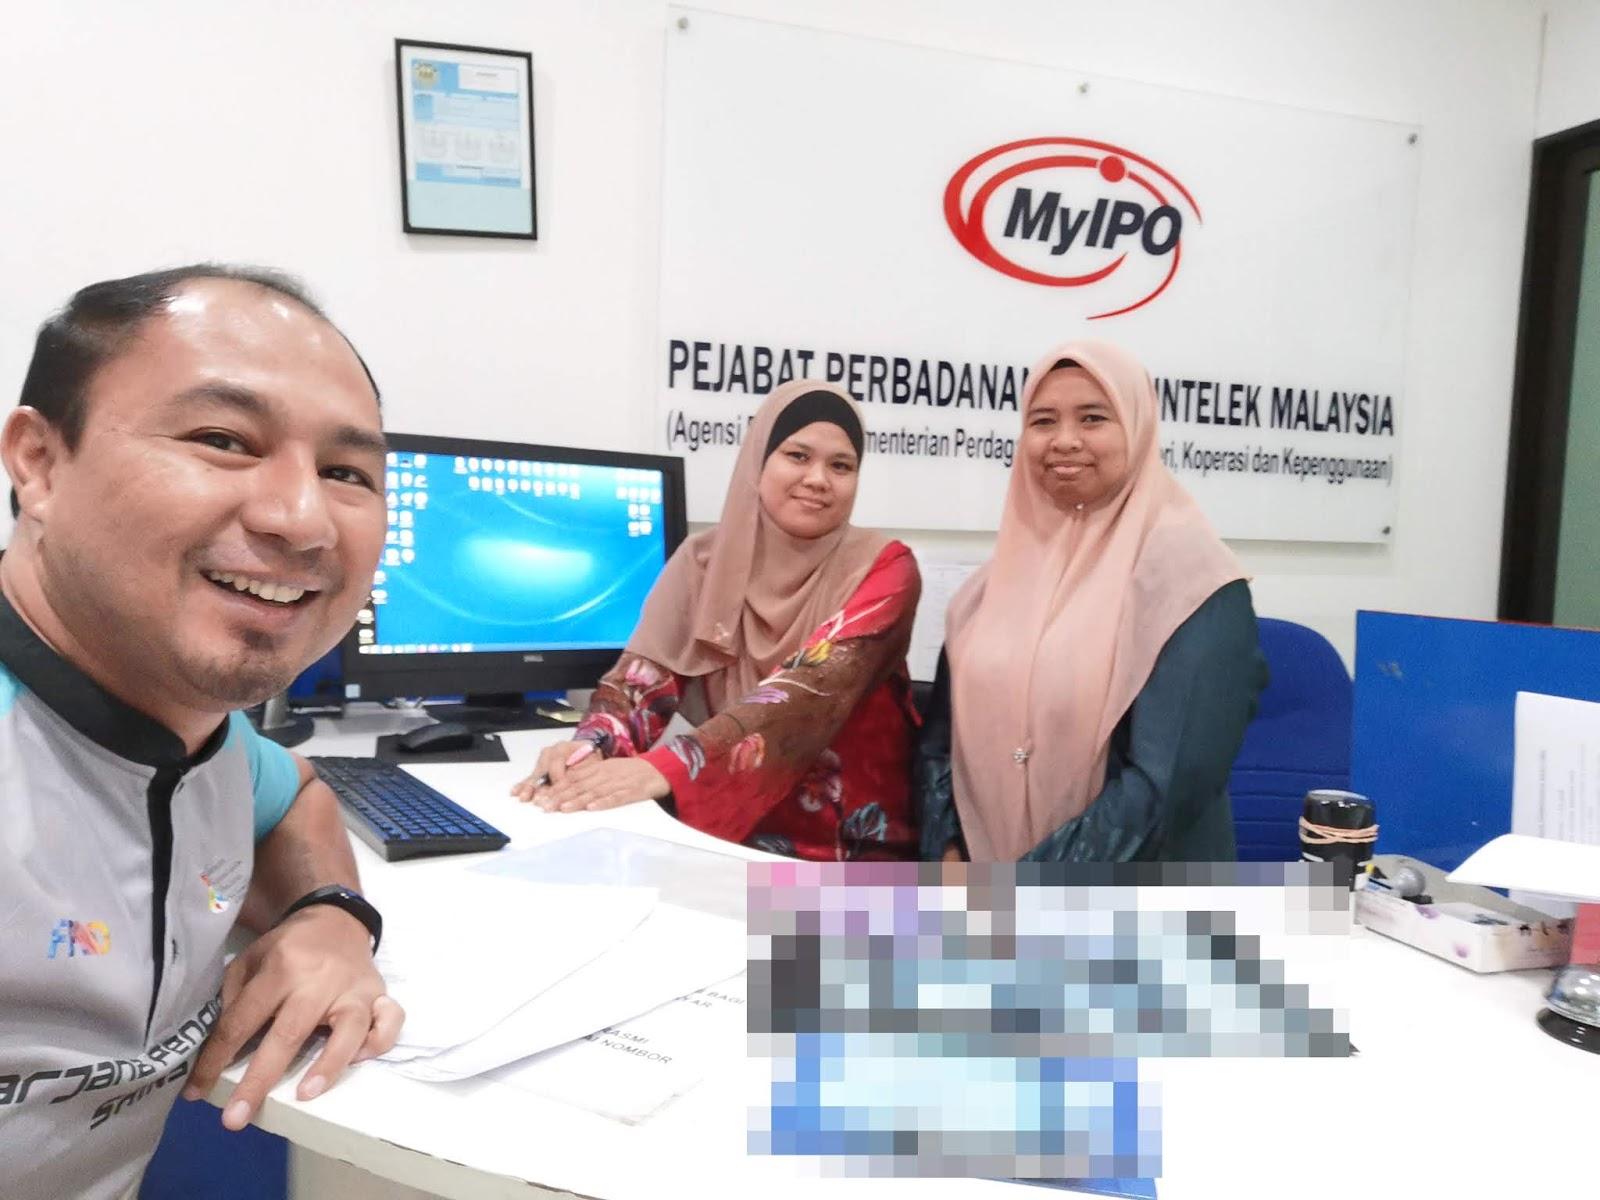 Bagaimana Saya Lindungi Inovasi Saya Dengan Myipo